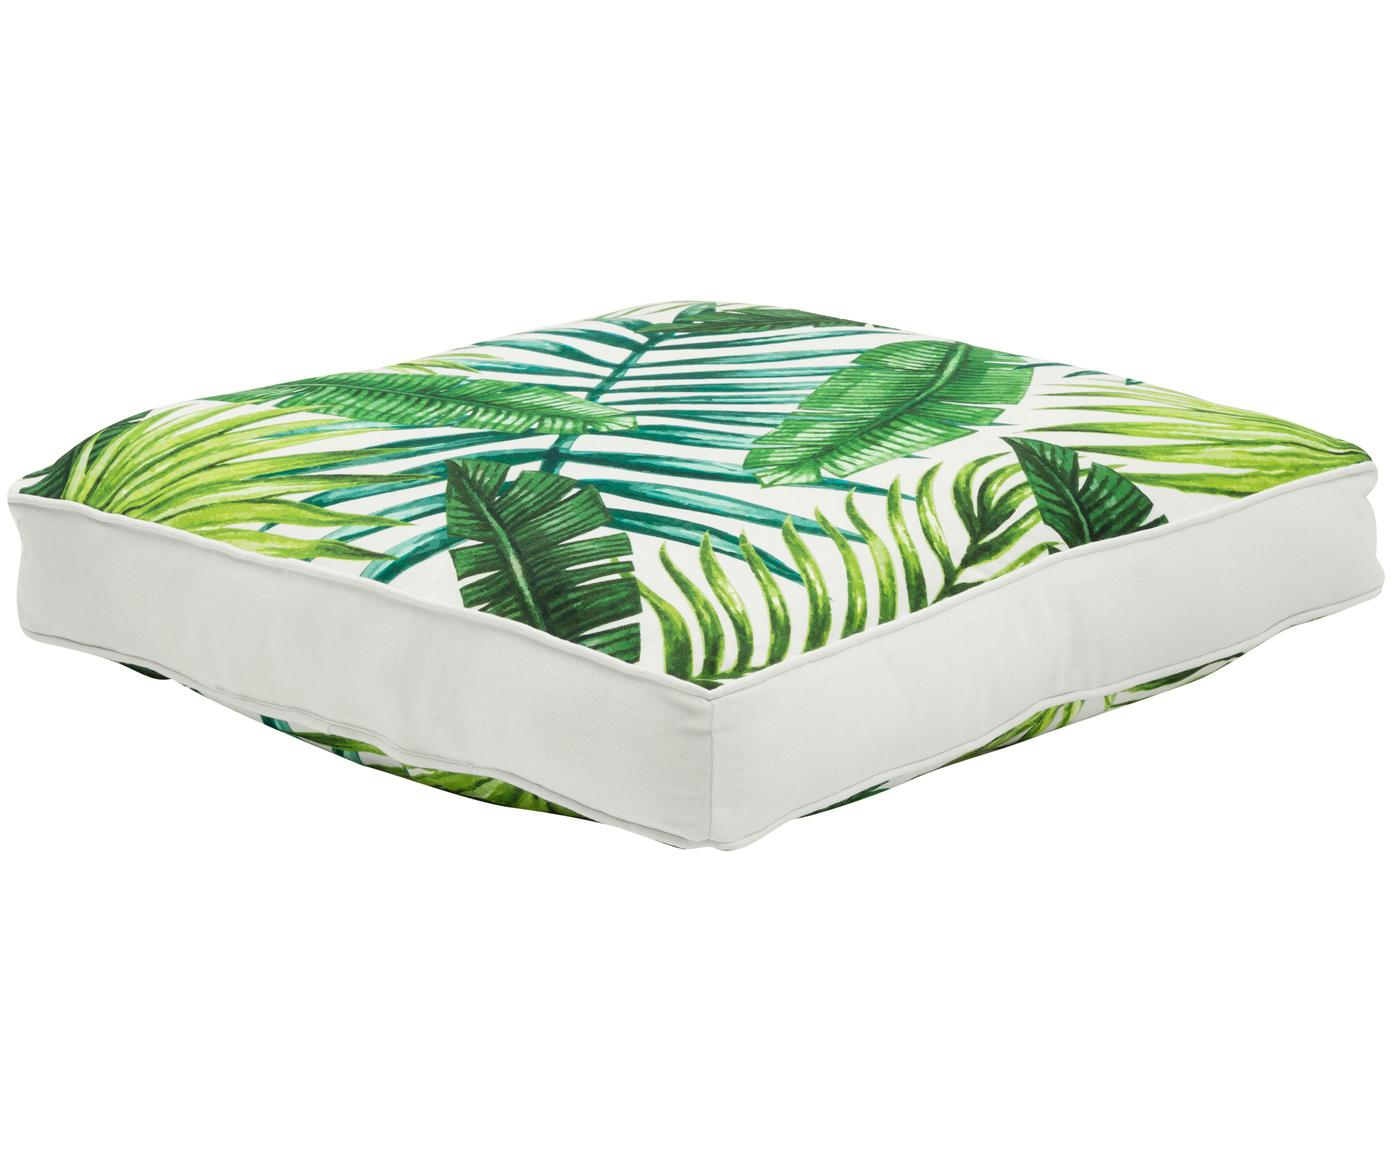 Cojín de asiento Jonna, Funda: 100%algodón, Verde, blanco crema, An 40 x L 40 cm